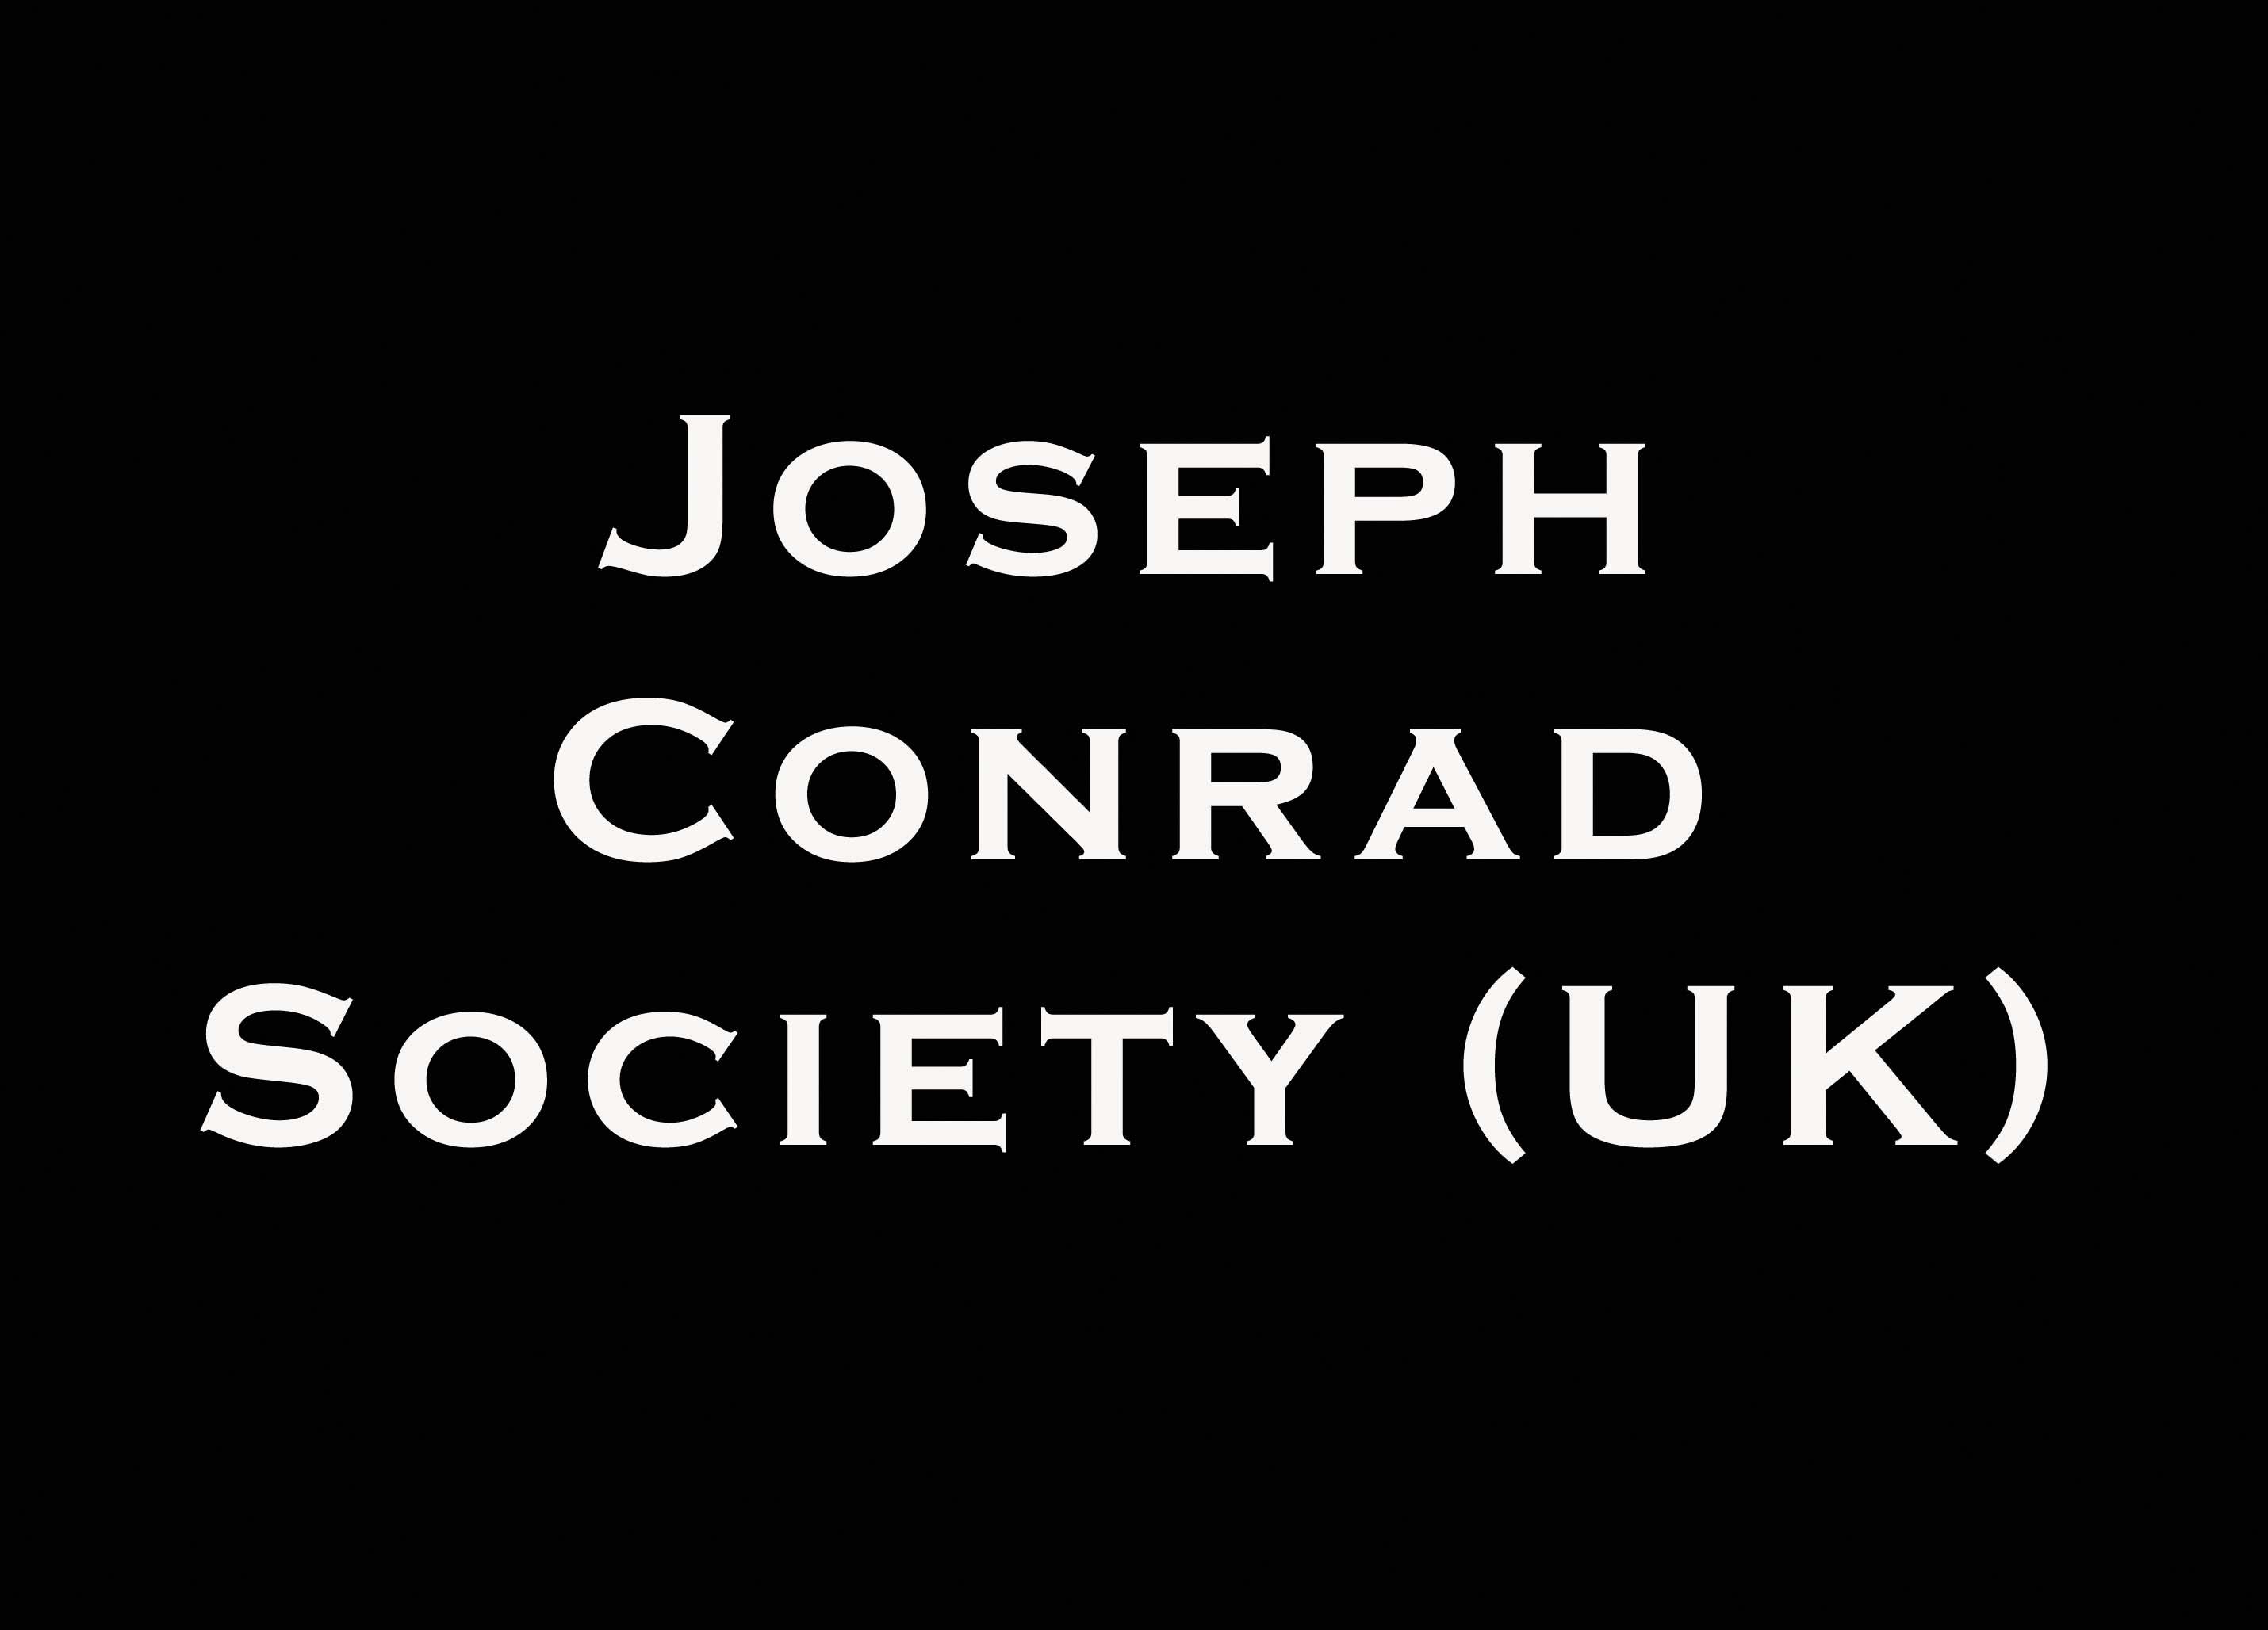 Joseph Conrad Society UK